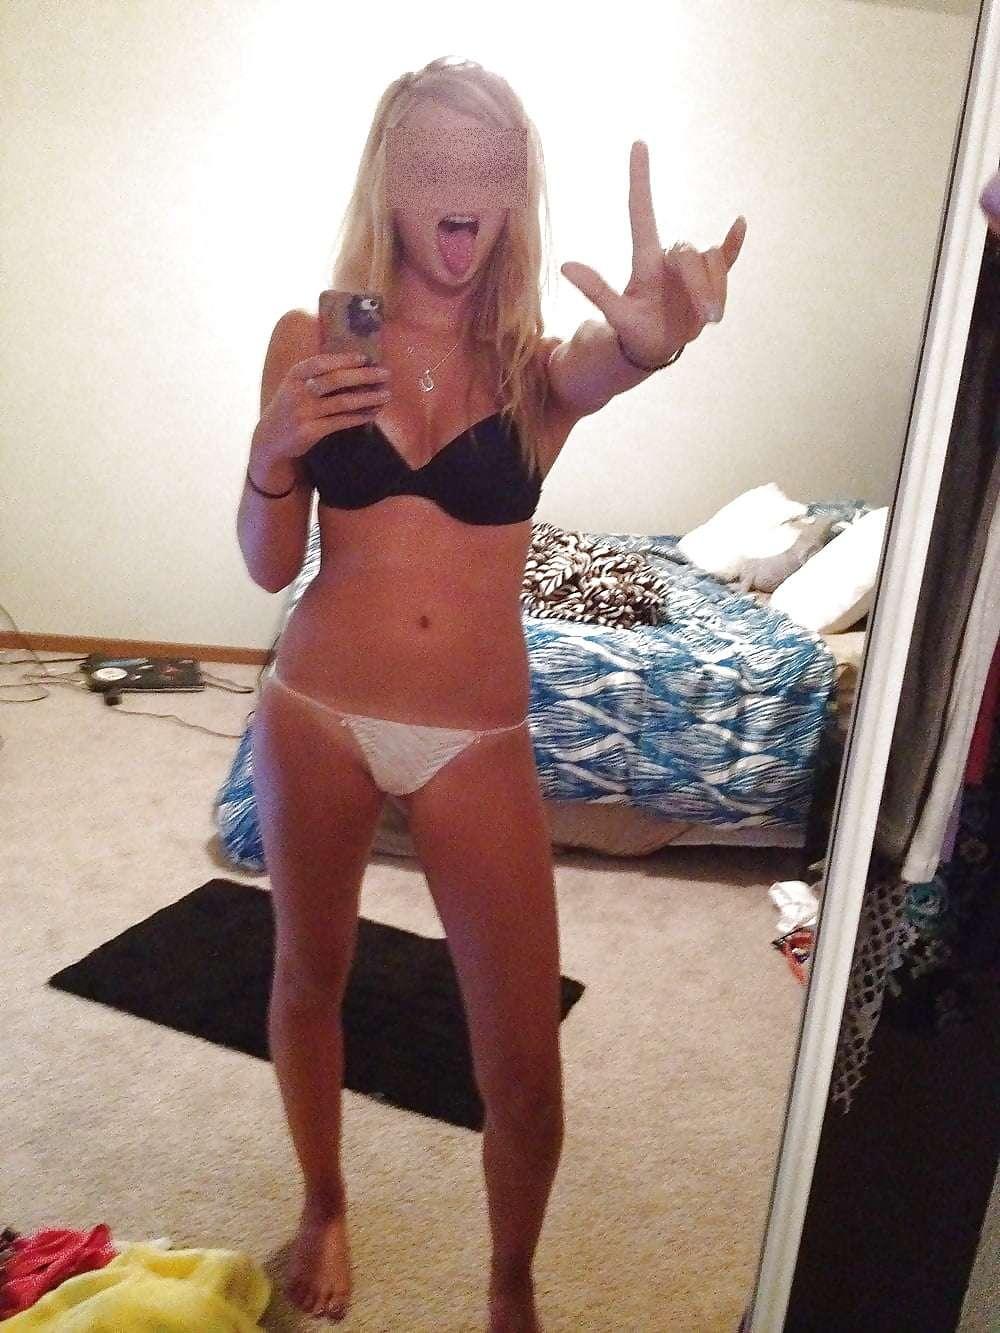 Mélissa du 26 cherche son fuckfriend black TBM